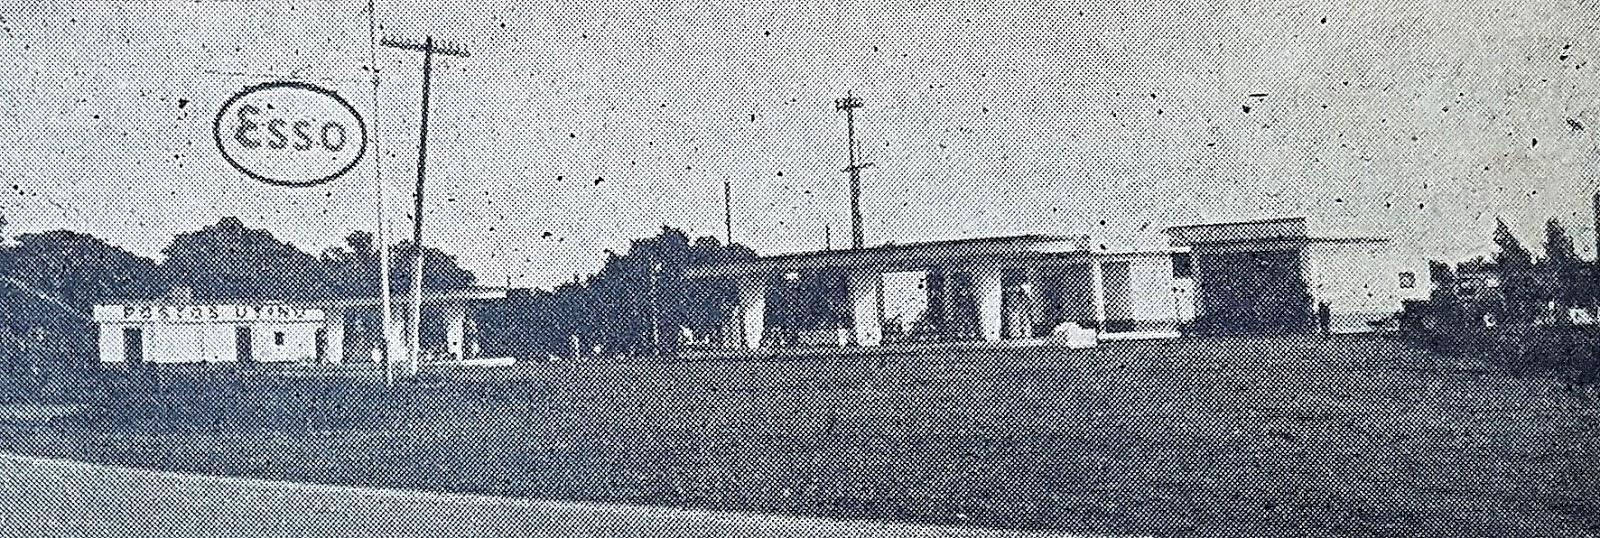 Posto Utino - Década de 1960